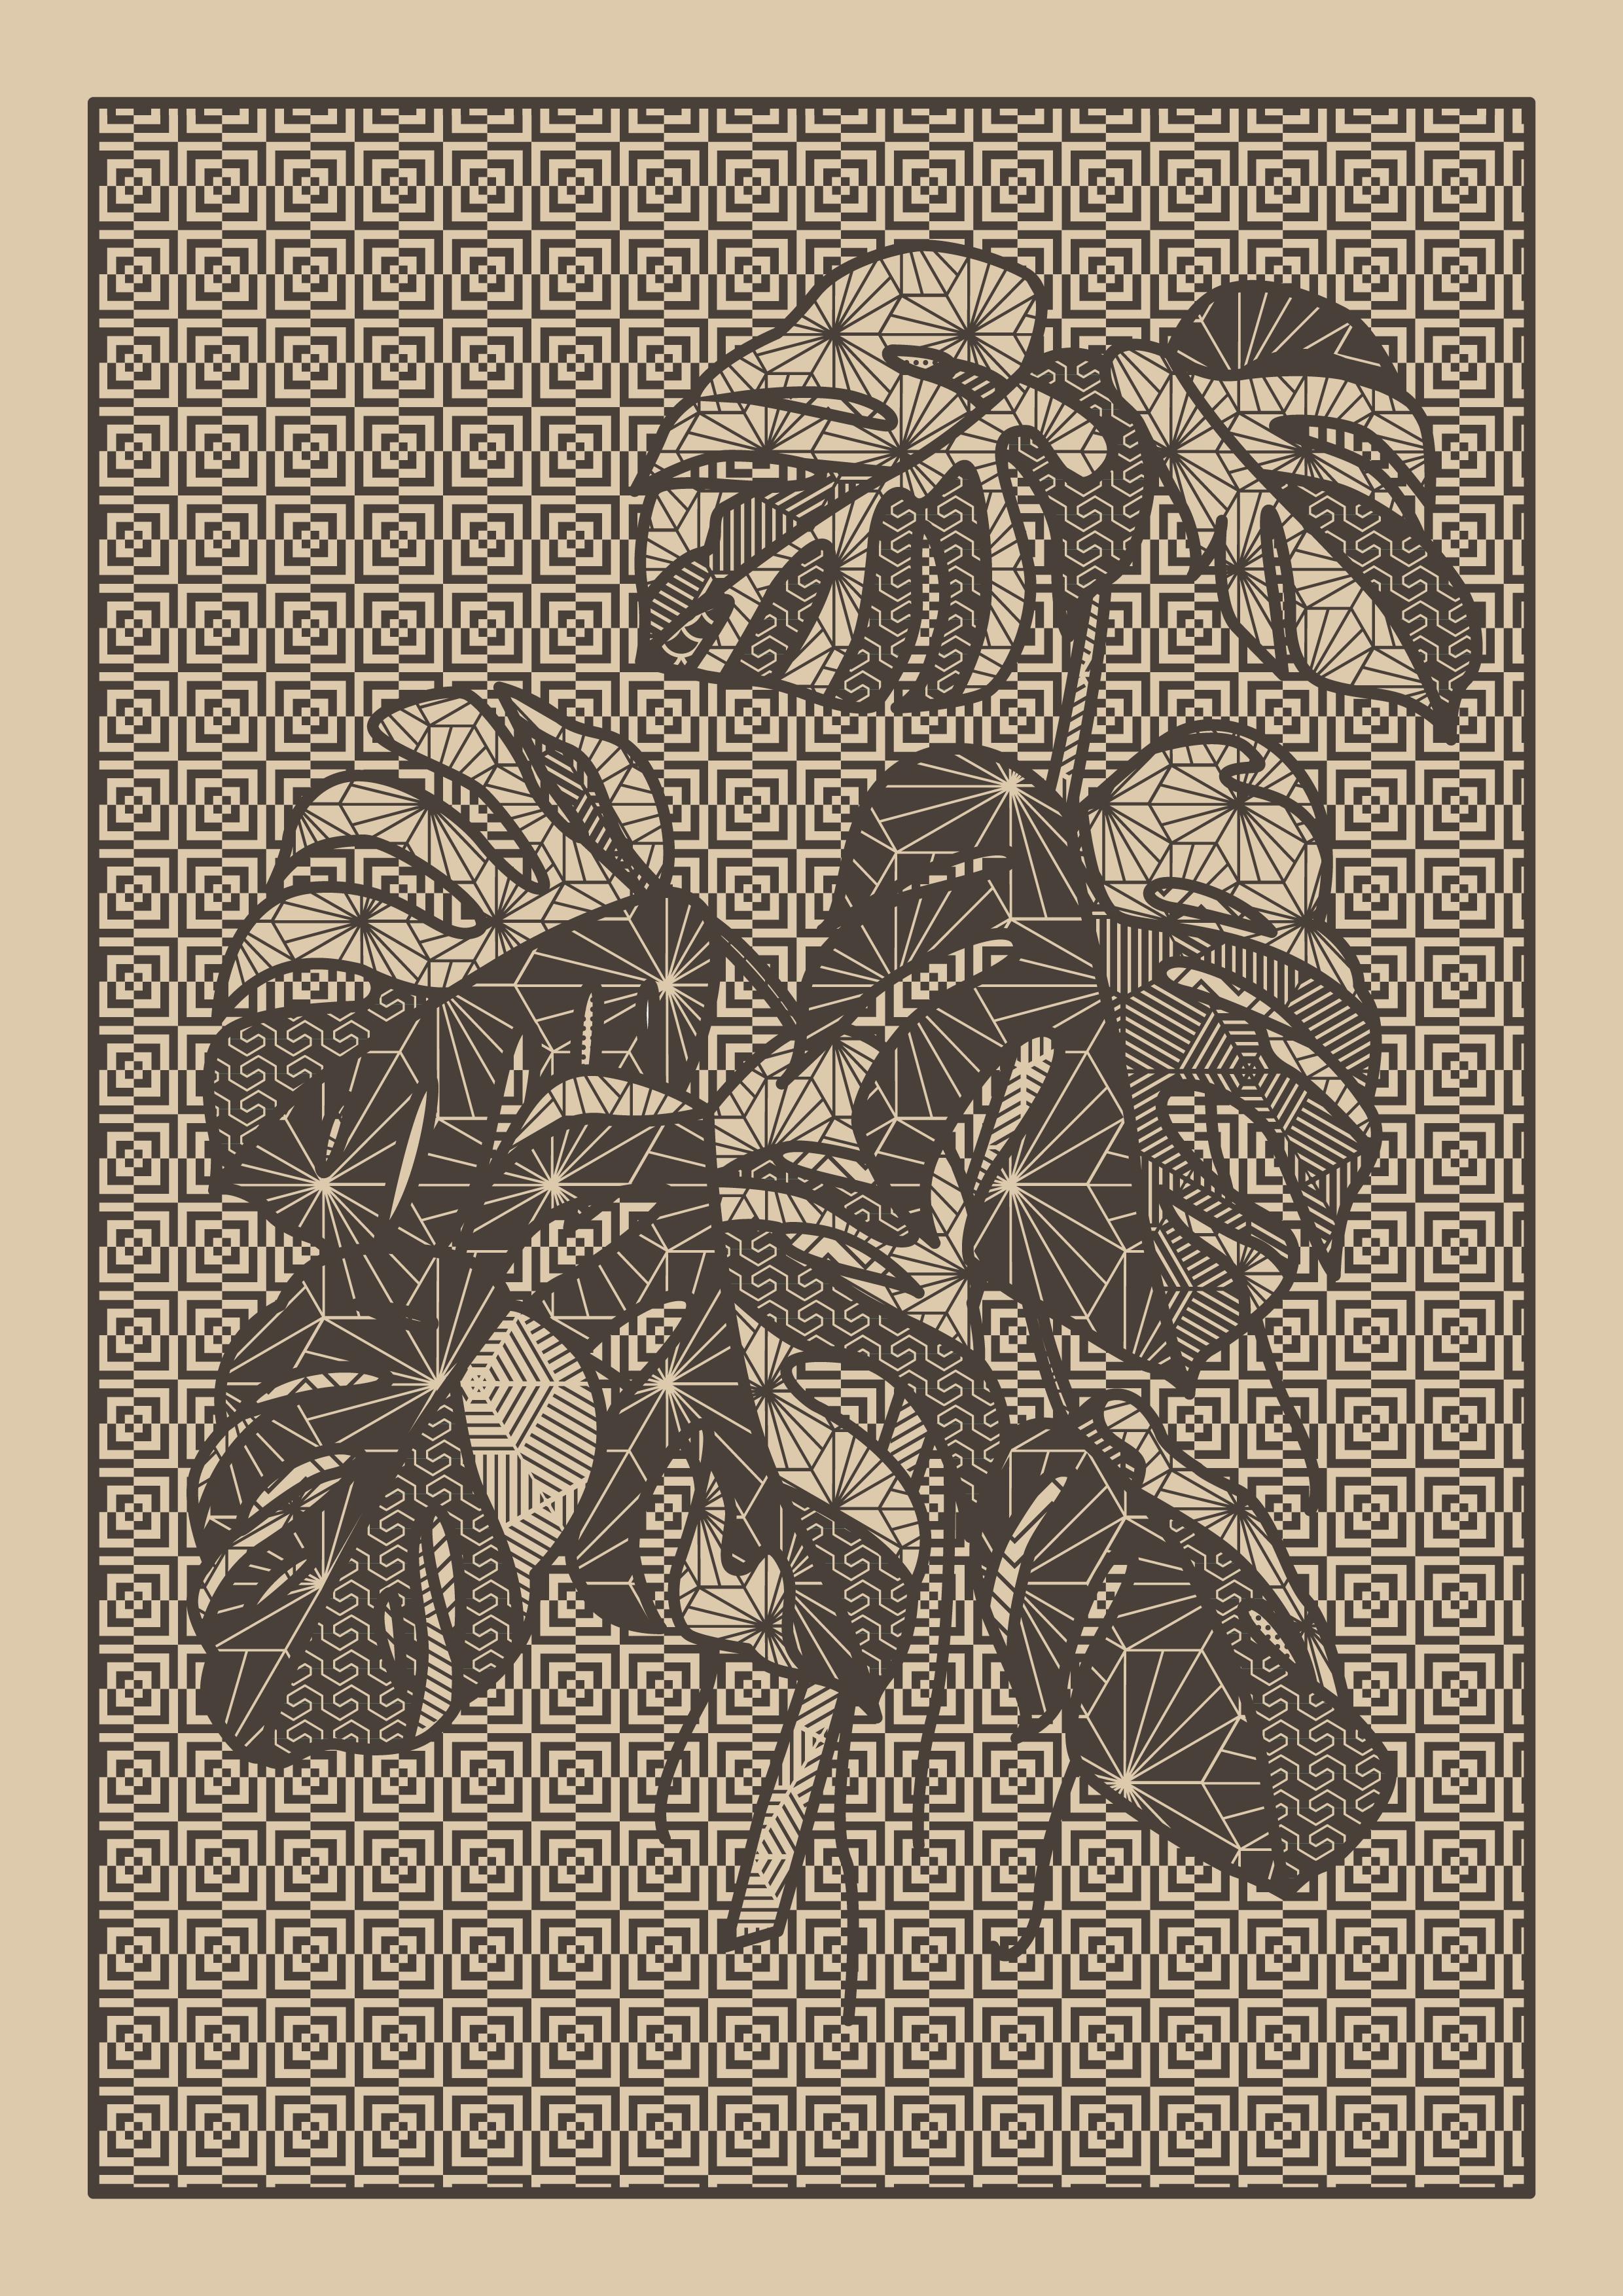 Moroccan_botanics1.png